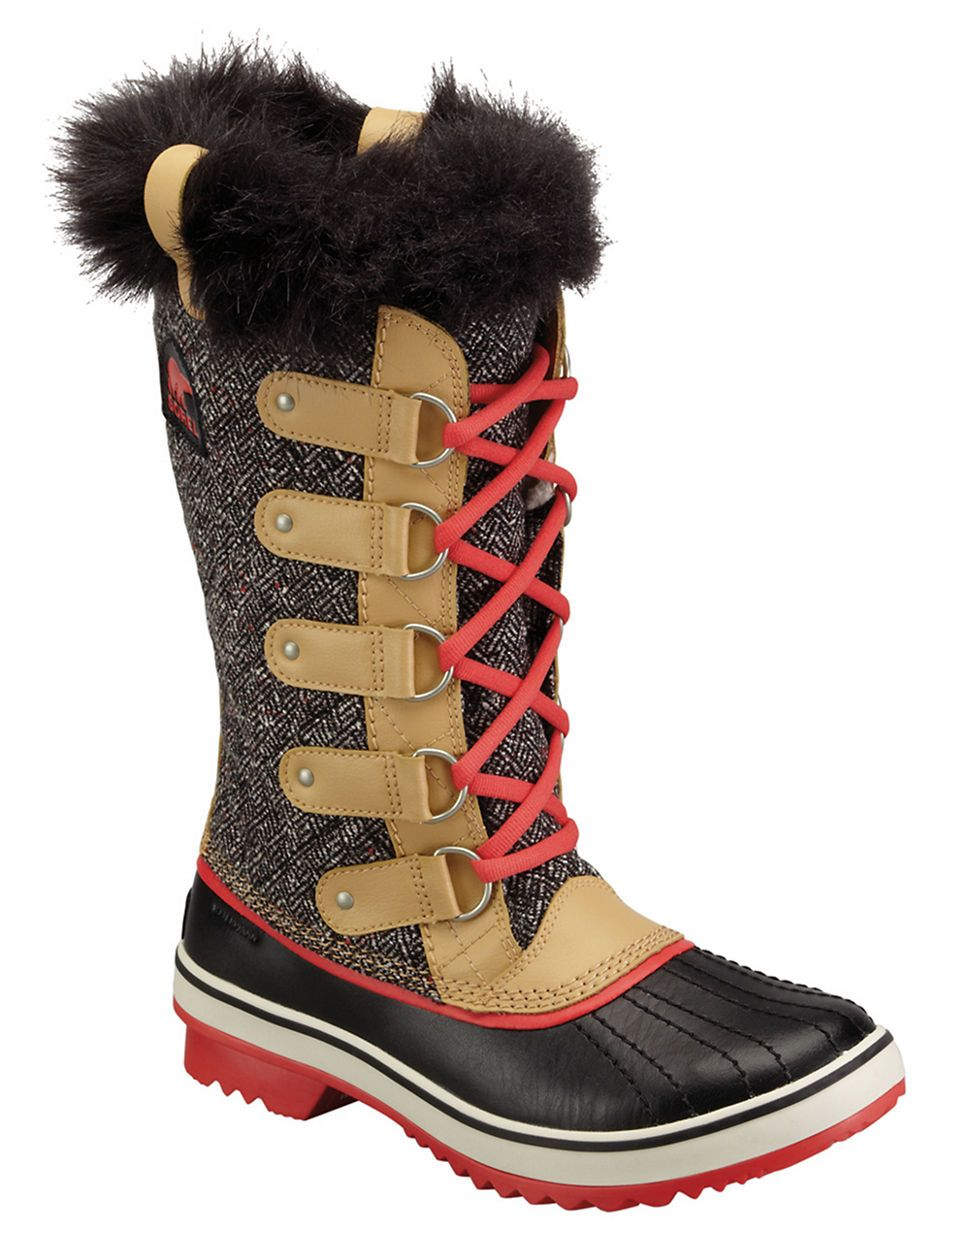 Boots, Winter boots women, Sorel tofino